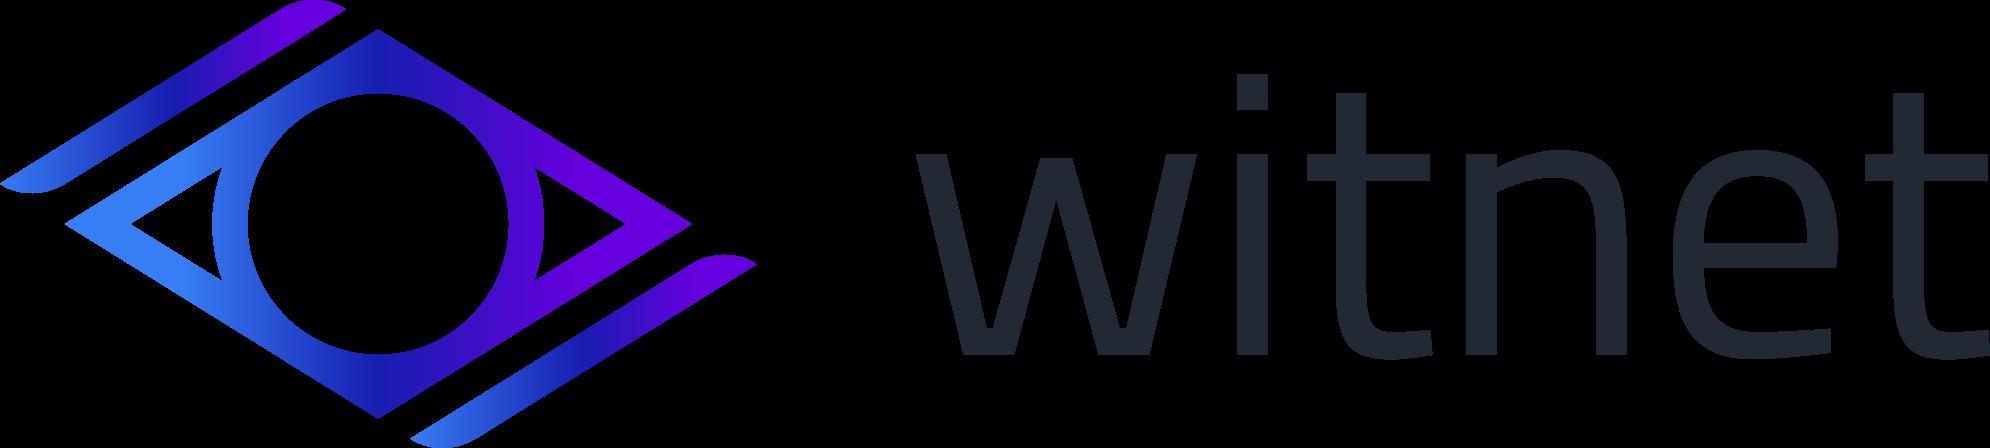 Witnet Foundation